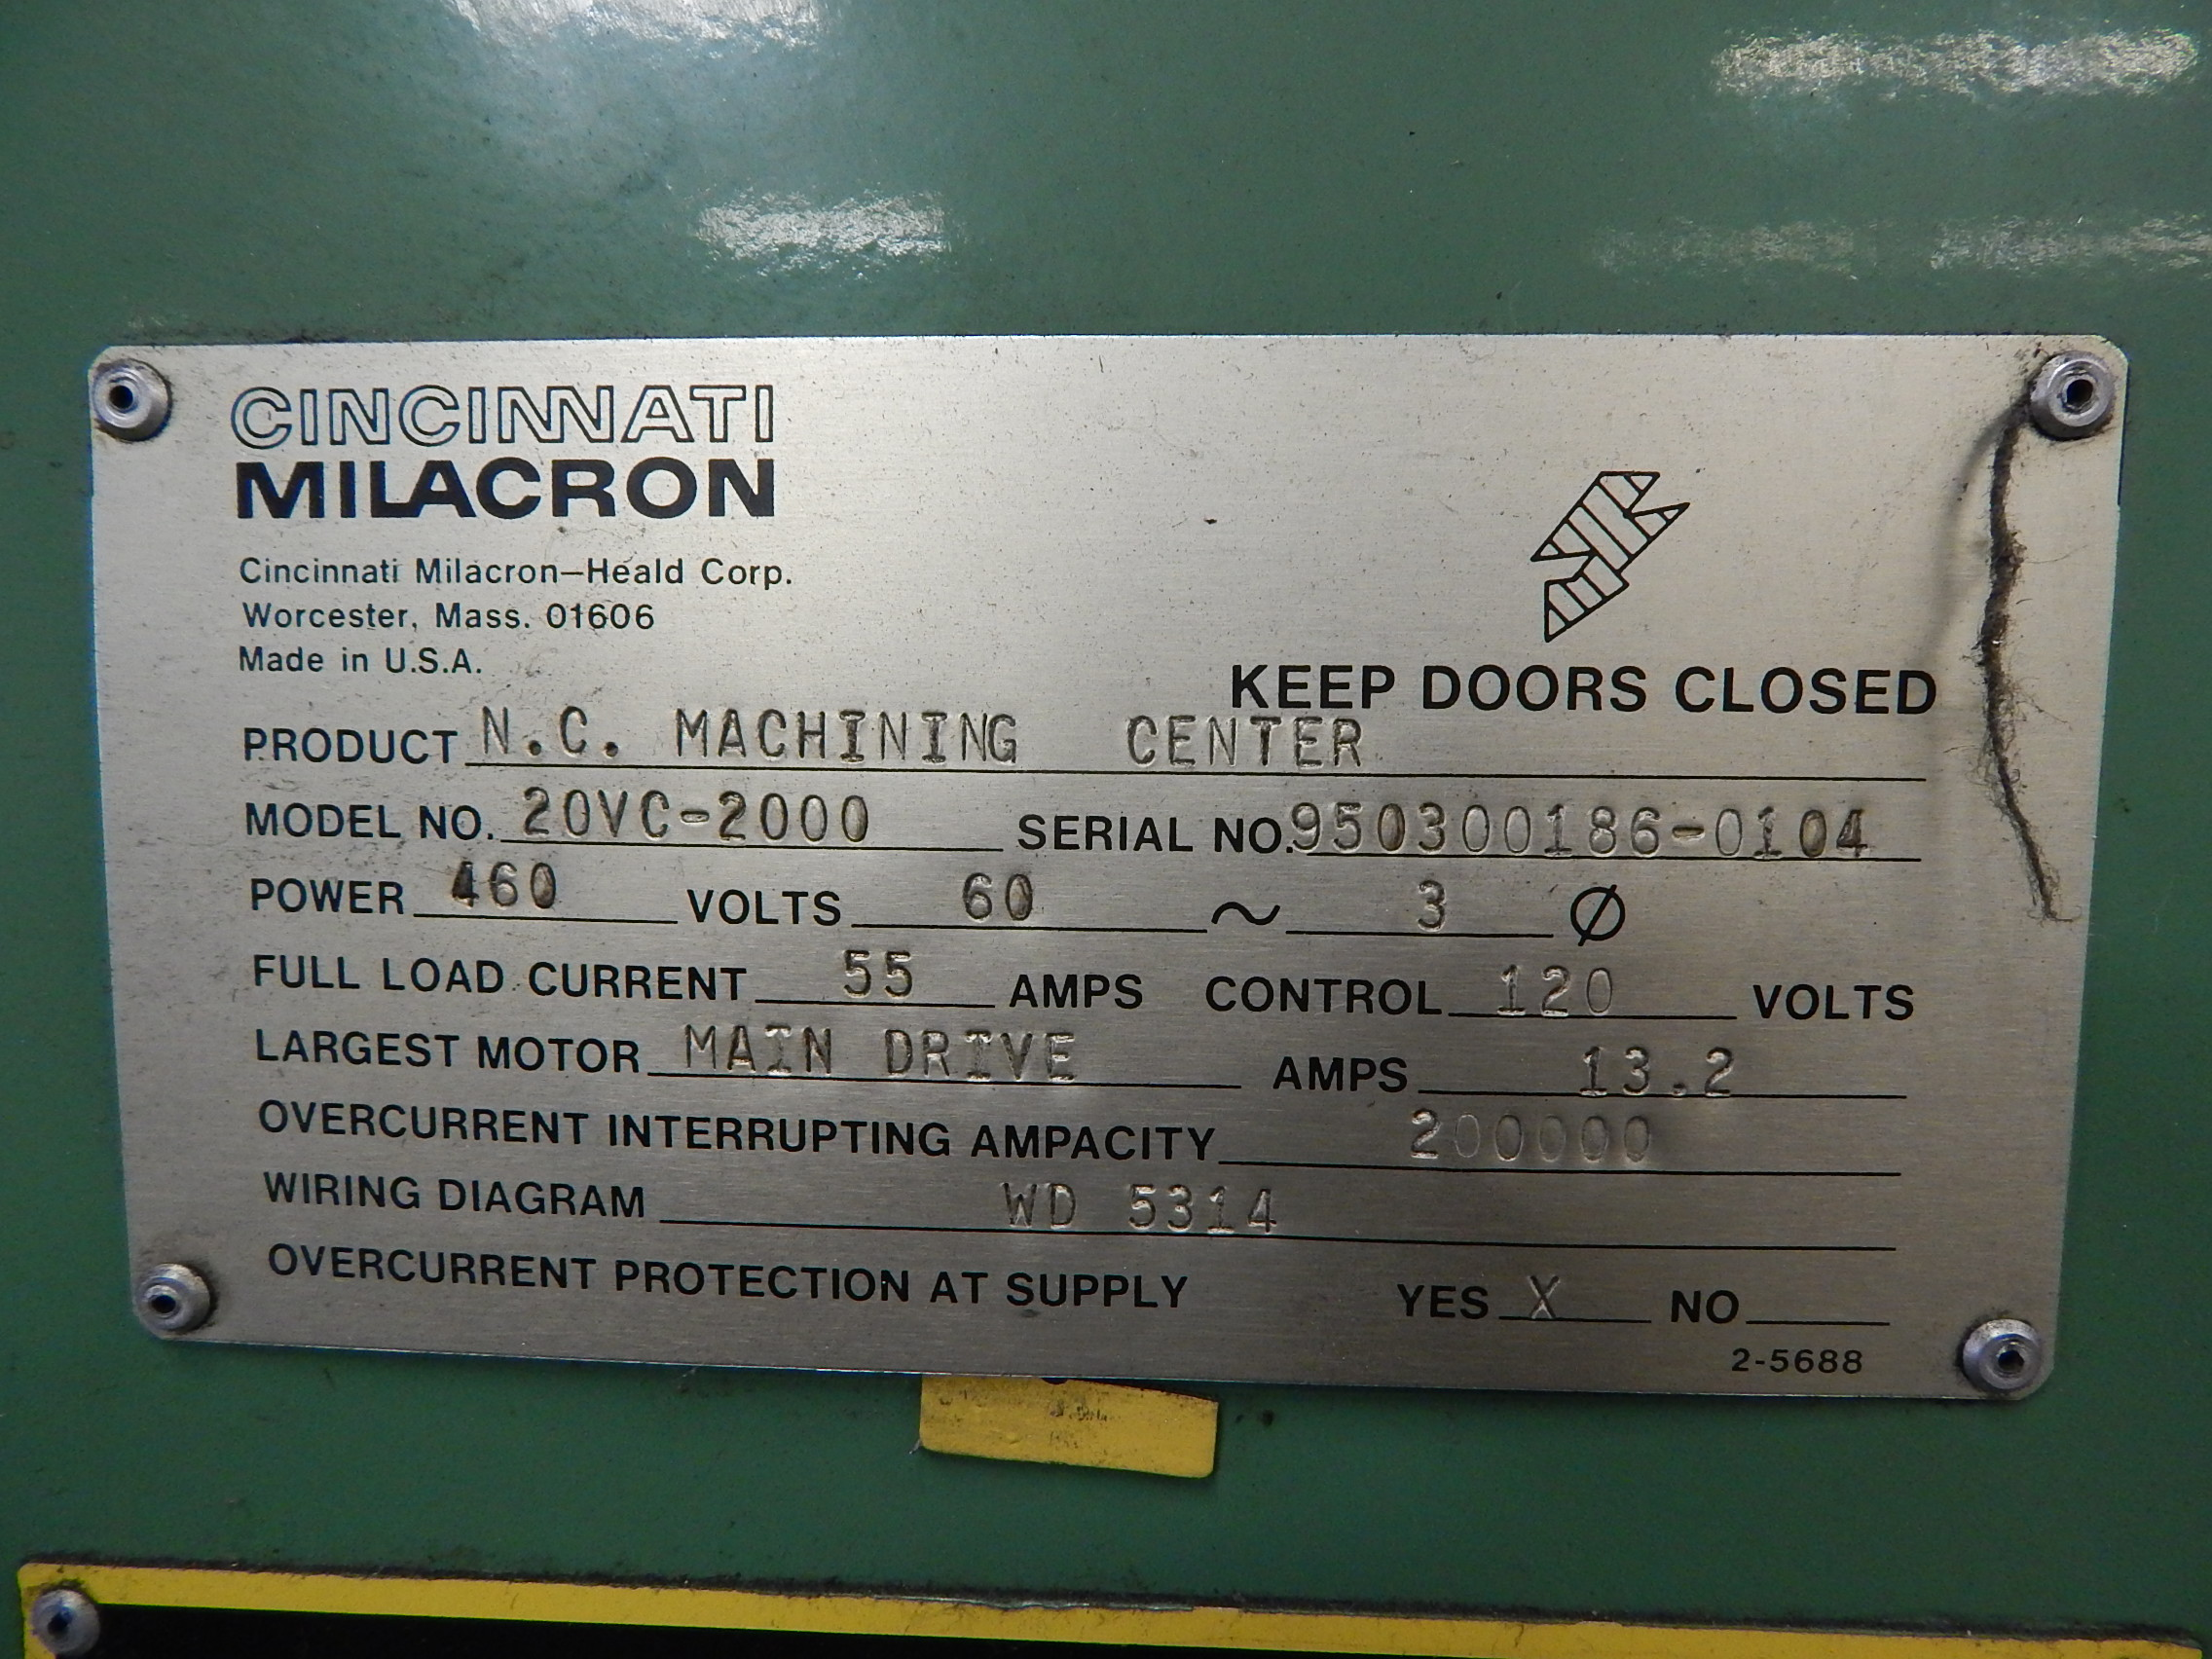 cincinnati milacron model 20vc 2000 cnc vertical machining center s lot 242 cincinnati milacron model 20vc 2000 cnc vertical machining center s